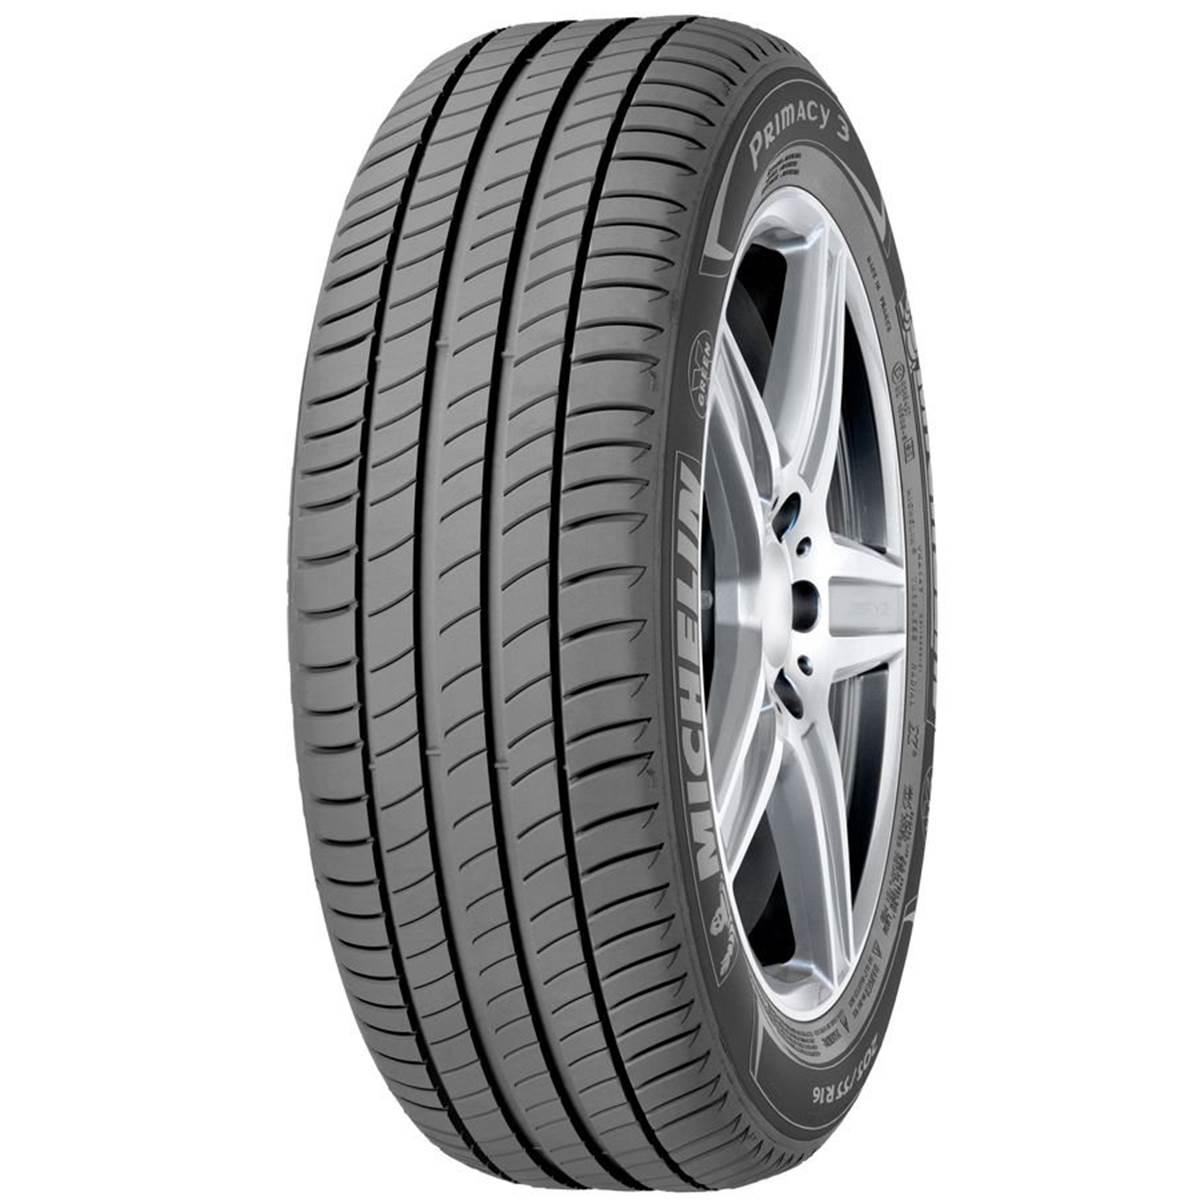 Pneu Michelin 225/50R17 98Y Primacy 3 XL